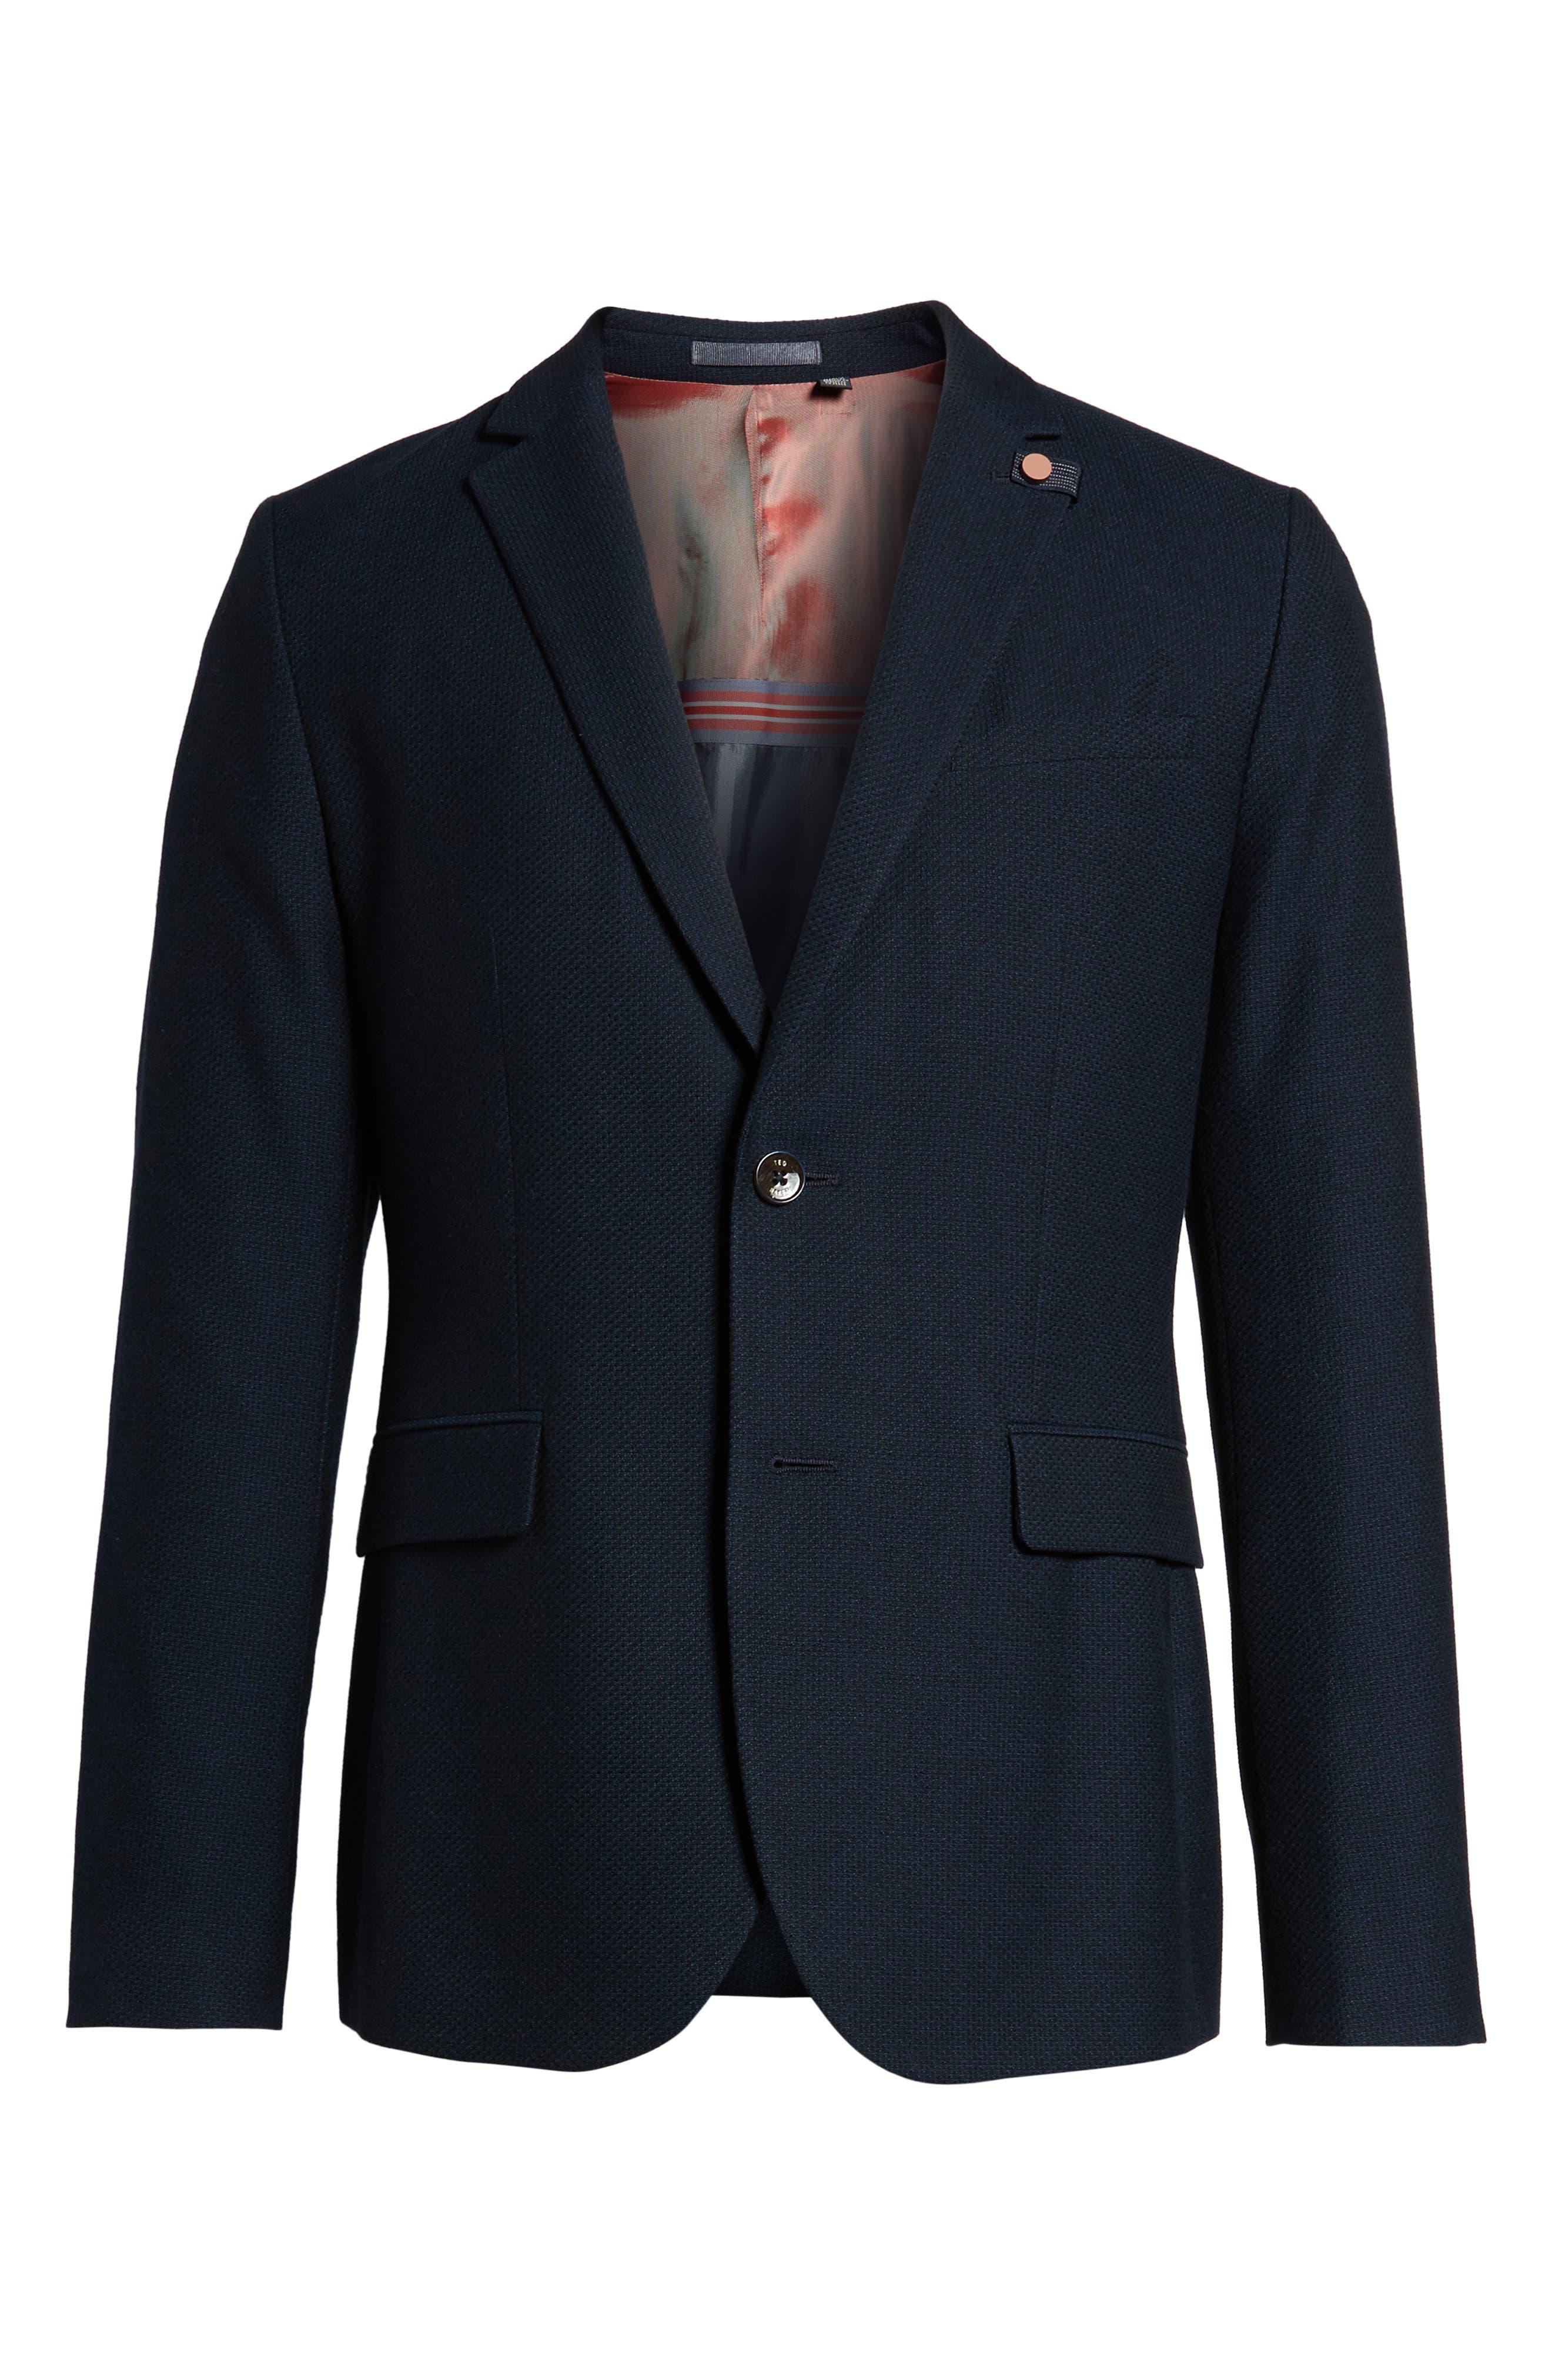 Olsson Textured Sport Coat,                             Alternate thumbnail 5, color,                             410